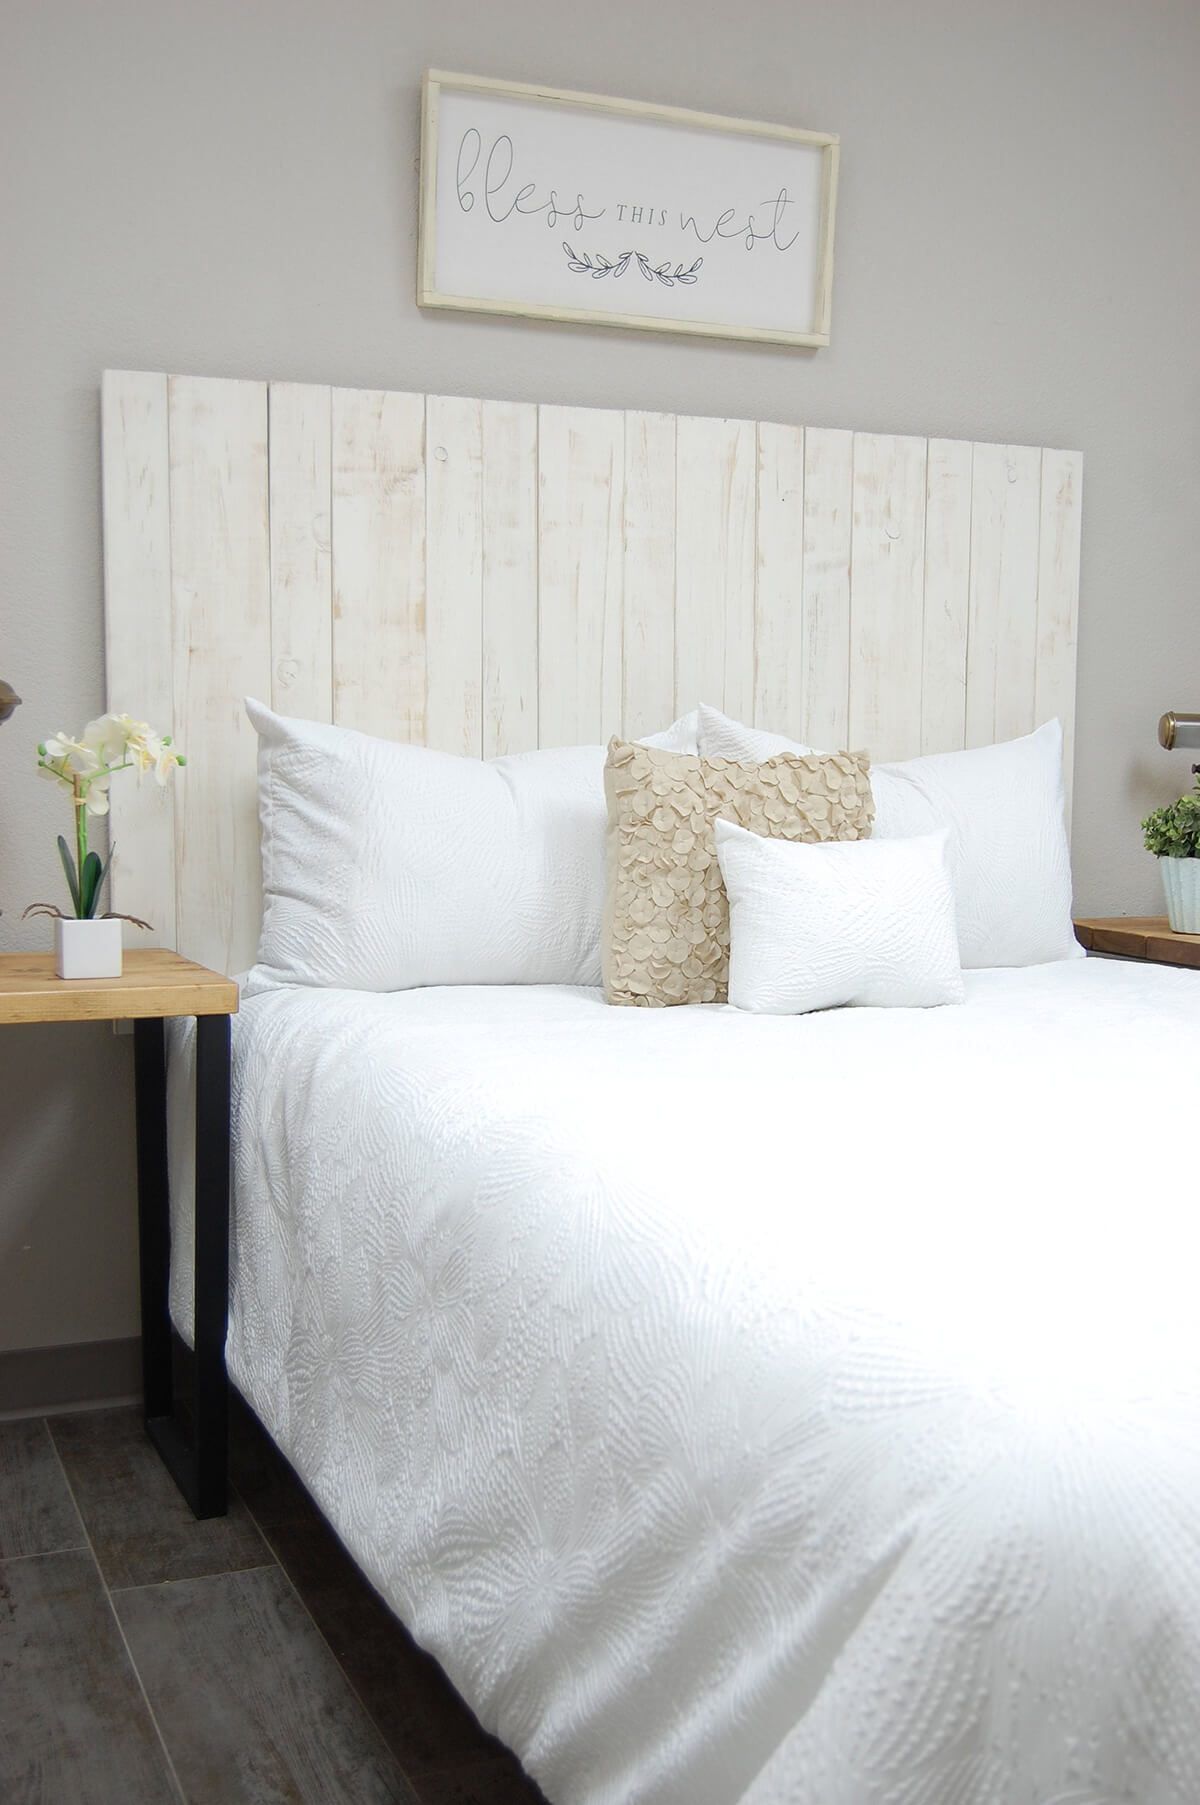 20 Best DIY Pallet Bed Frame Ideas to Update Your Bedroom ... on Bedroom Pallet Ideas  id=62757